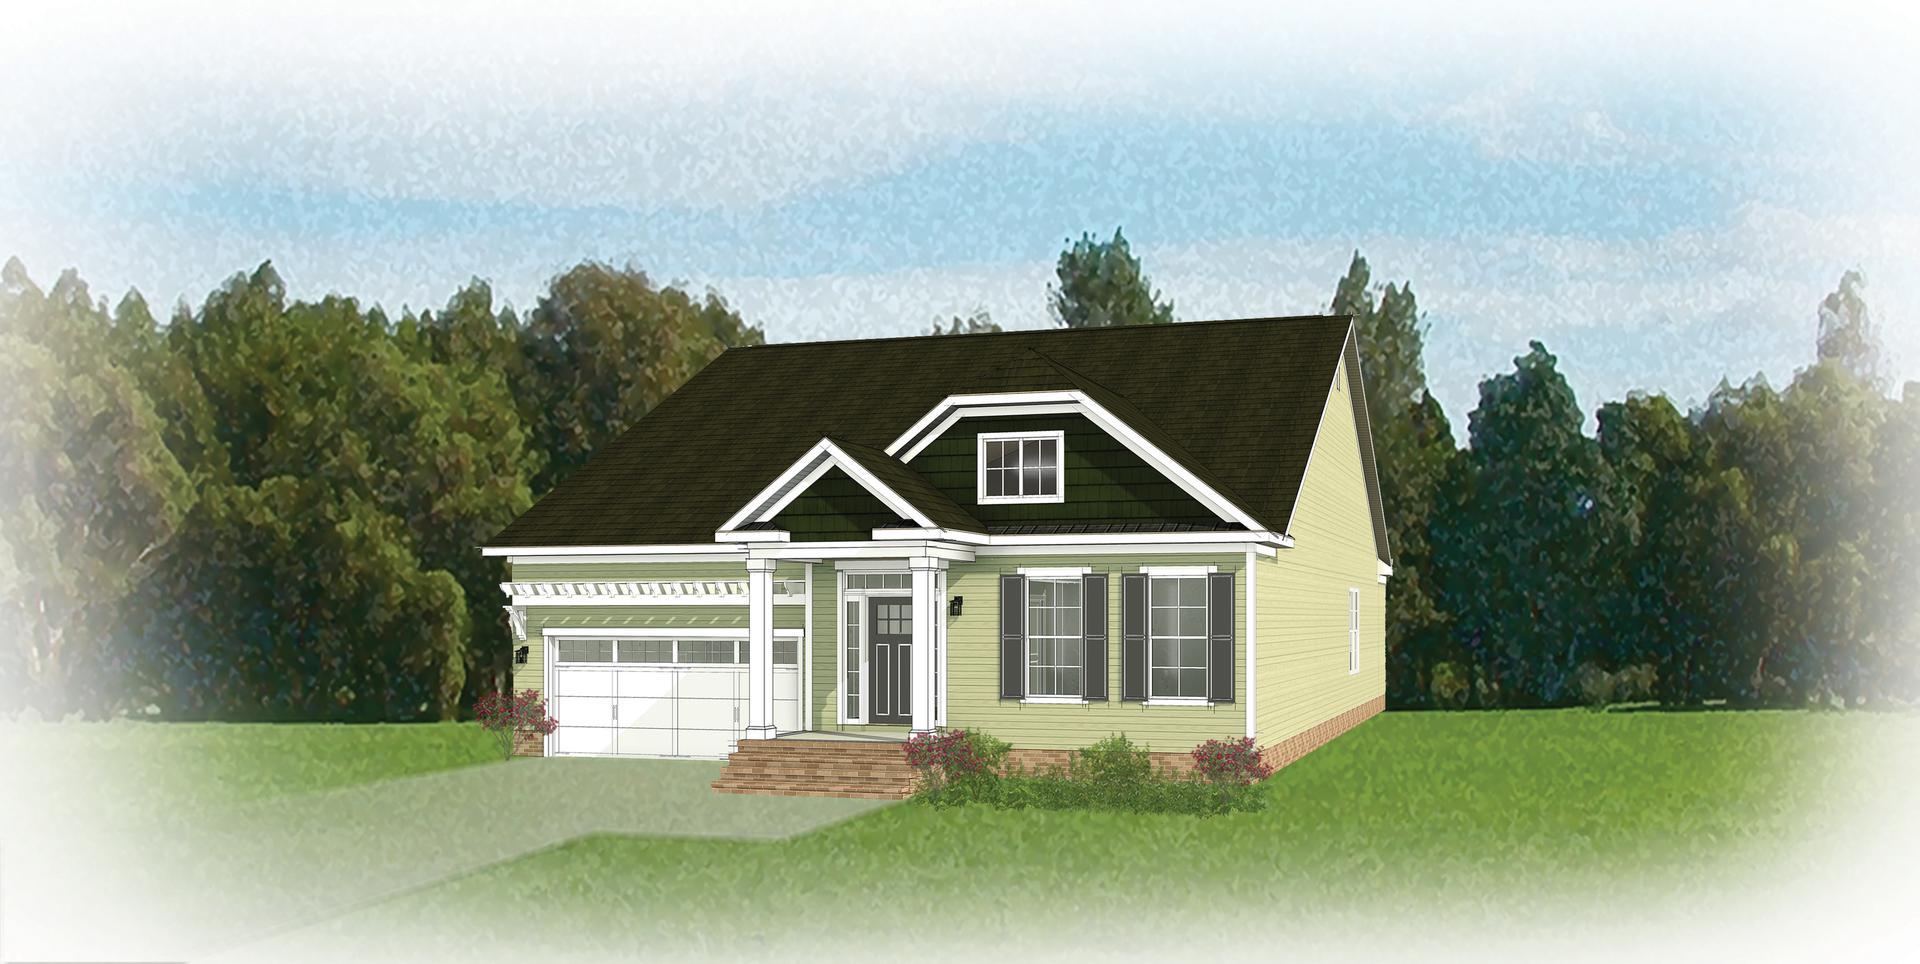 The Hadley new home in Ashland VA